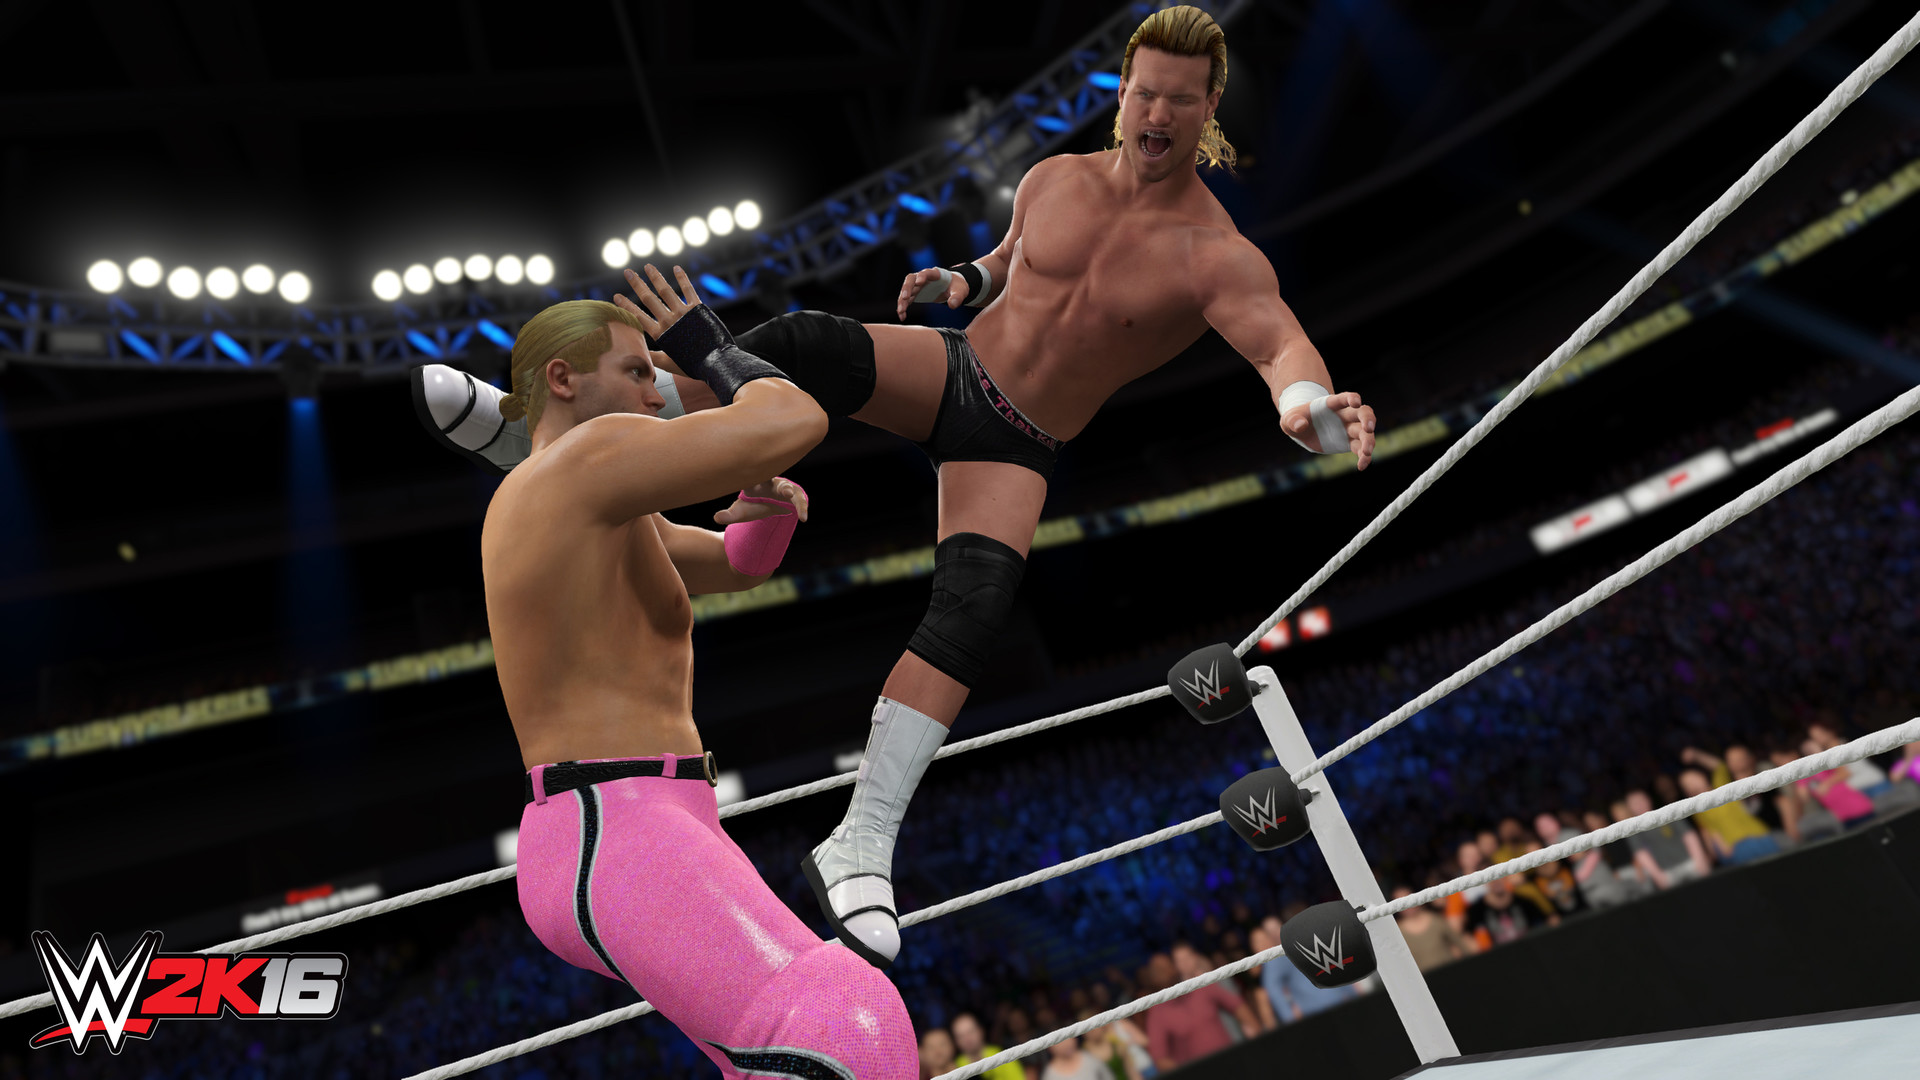 WWE 2K16 image 1